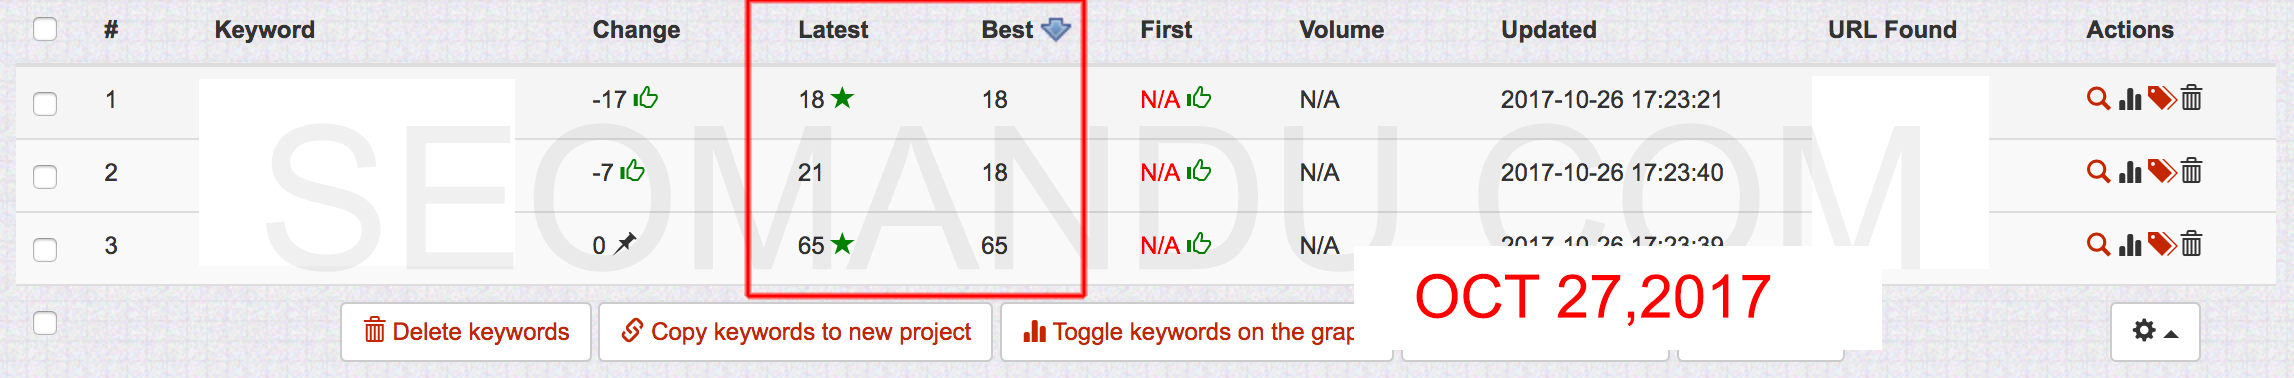 27 oct, 2017 GSA GSA Search Engine Ranker keywords update